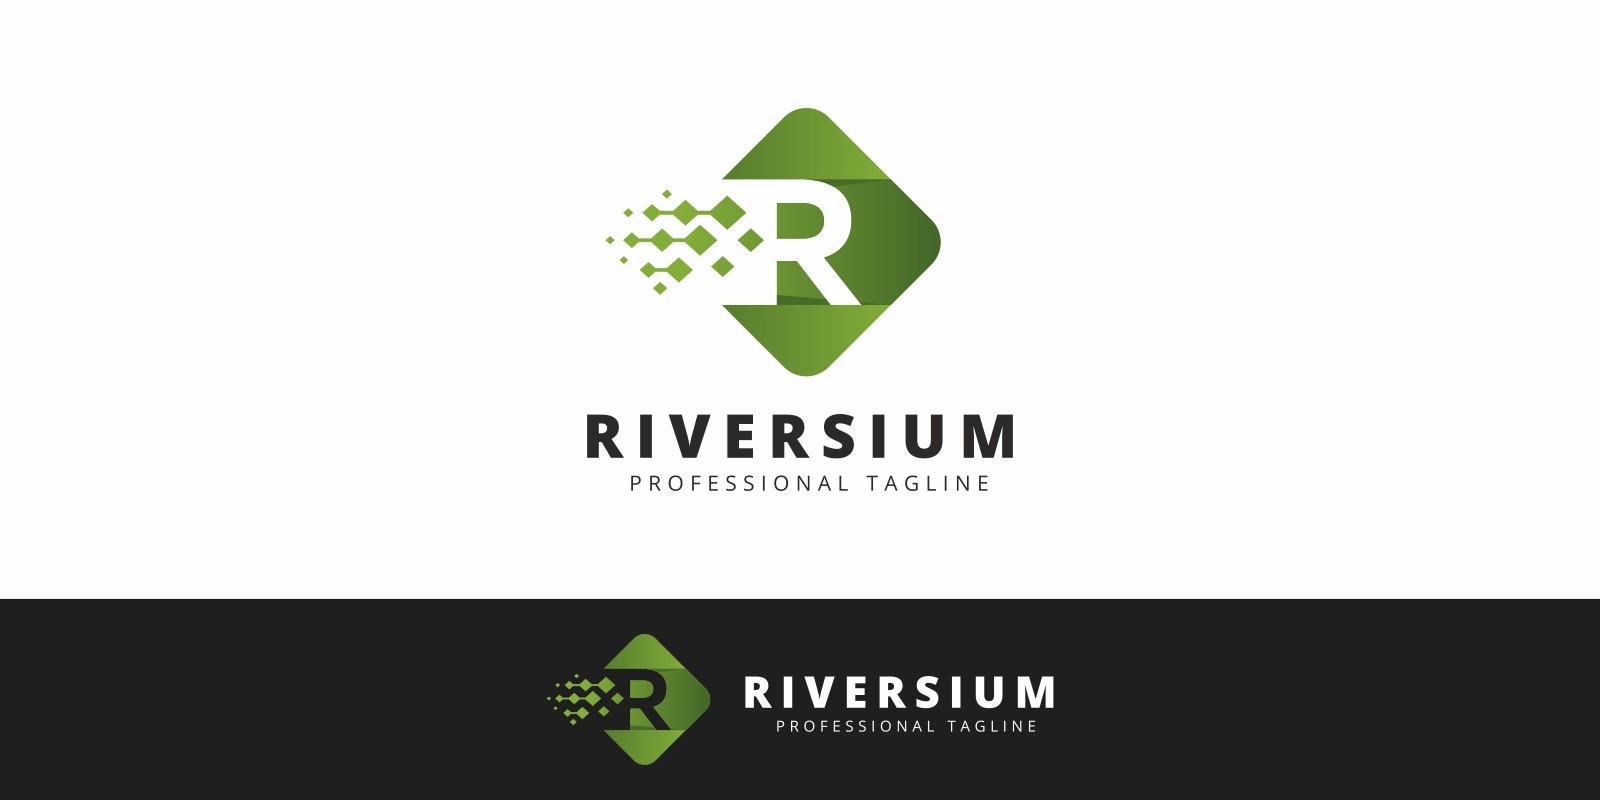 Riversium R Letter Logo